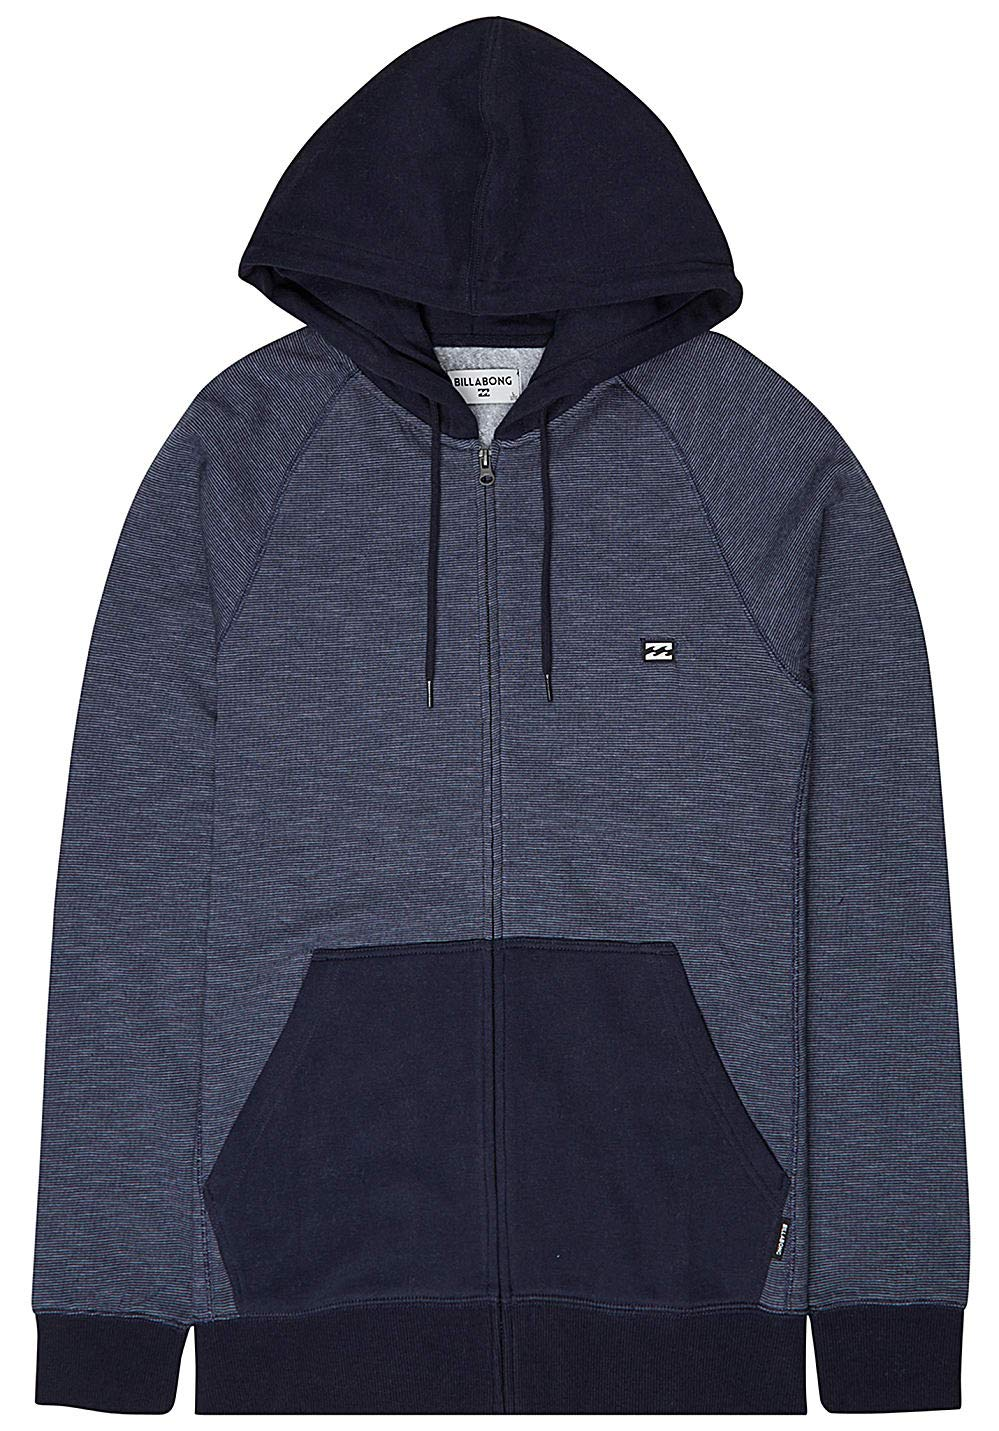 BILLABONG Herren Balance Zip Pullover